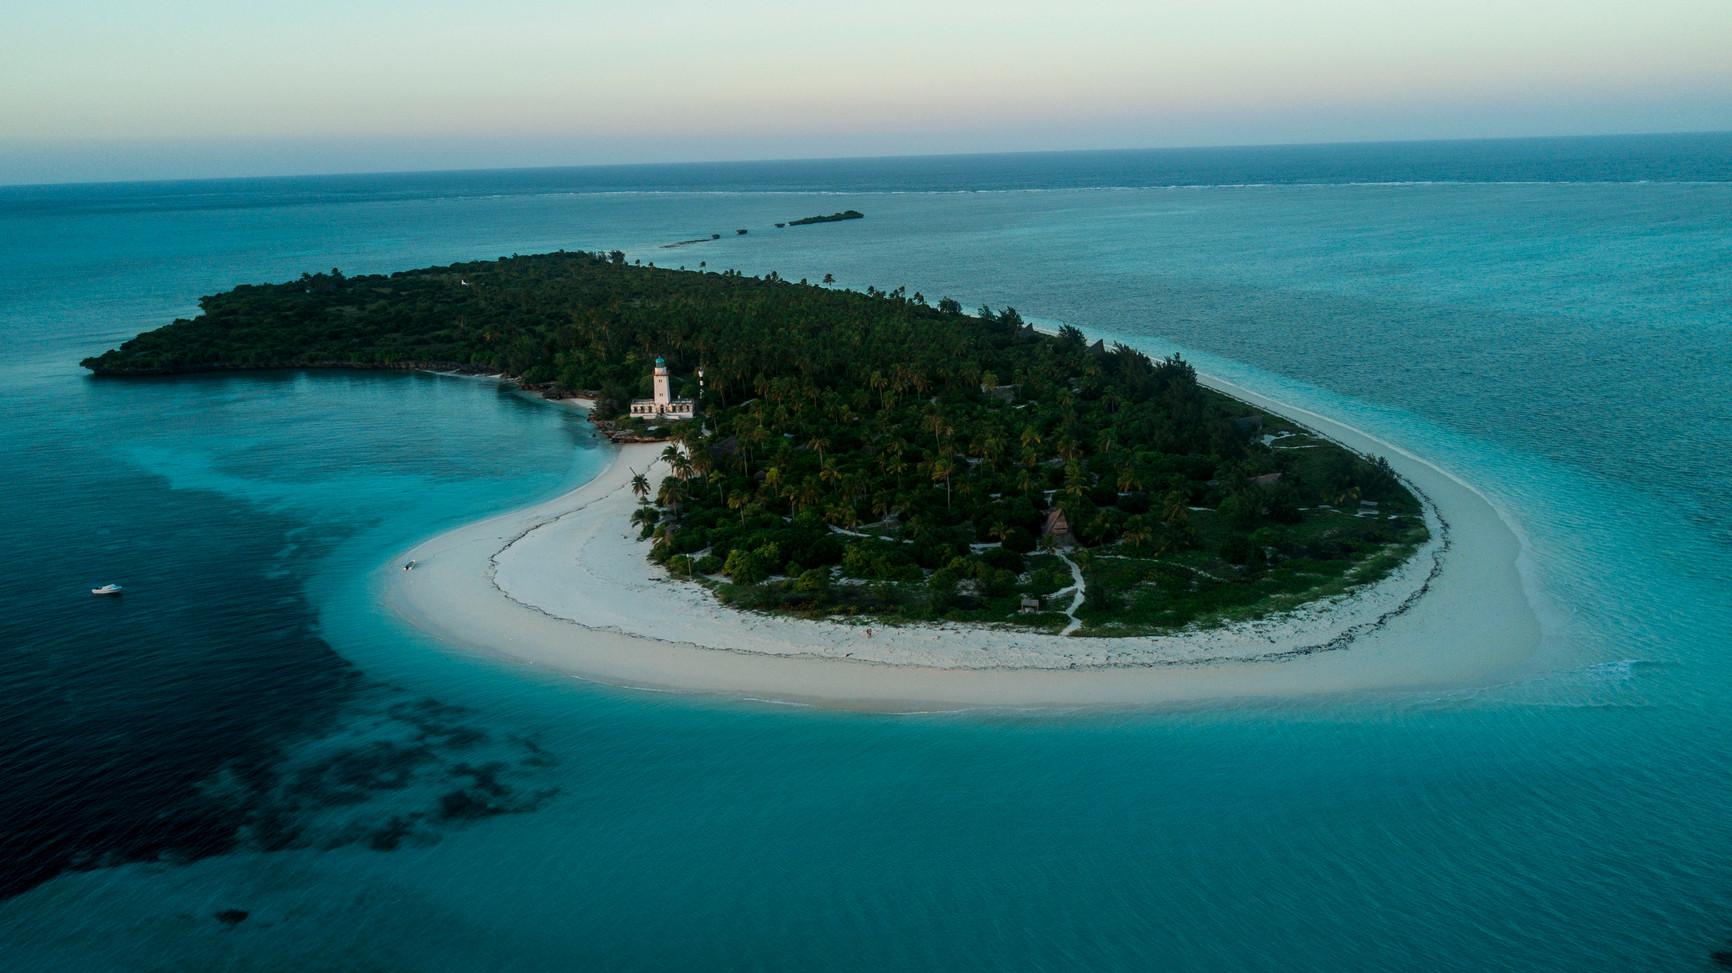 Tanzania Fanjove Island island Aerial